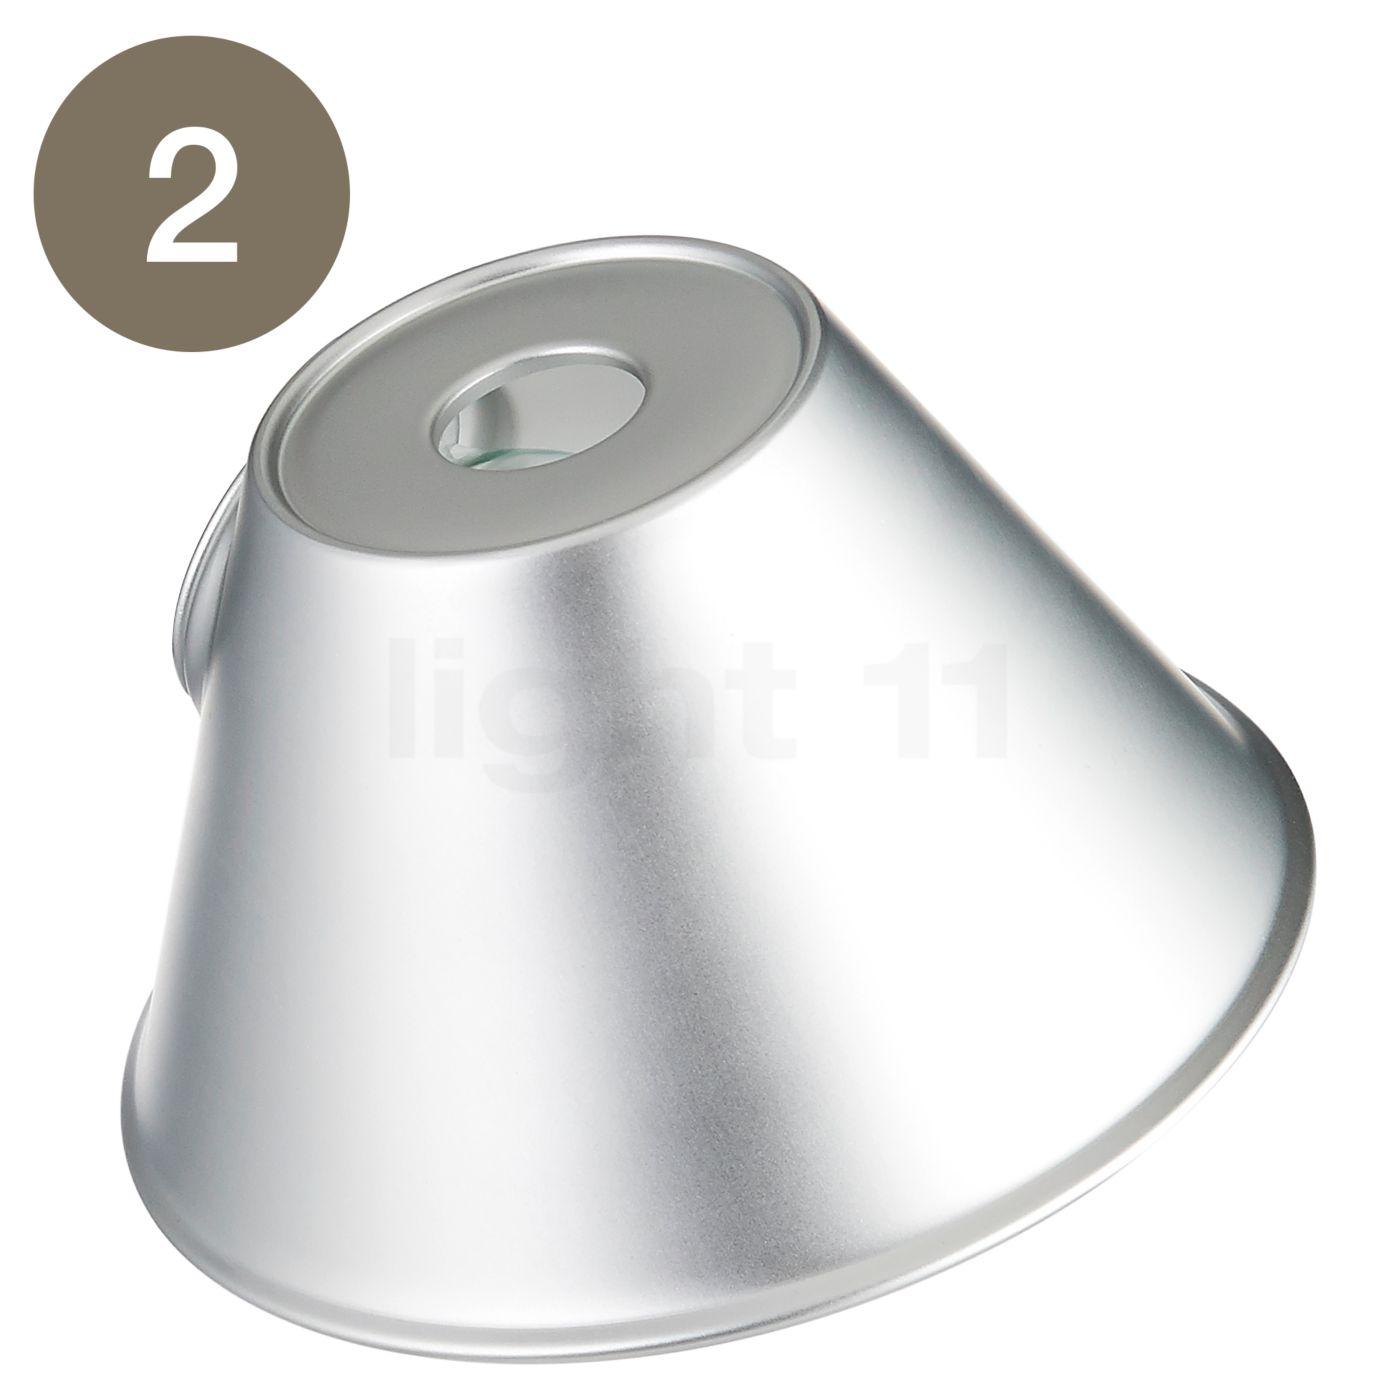 Artemide Spare parts for Tolomeo Tavolo and Tolomeo Terra  alu. Artemide Lighting Spare Parts. Home Design Ideas